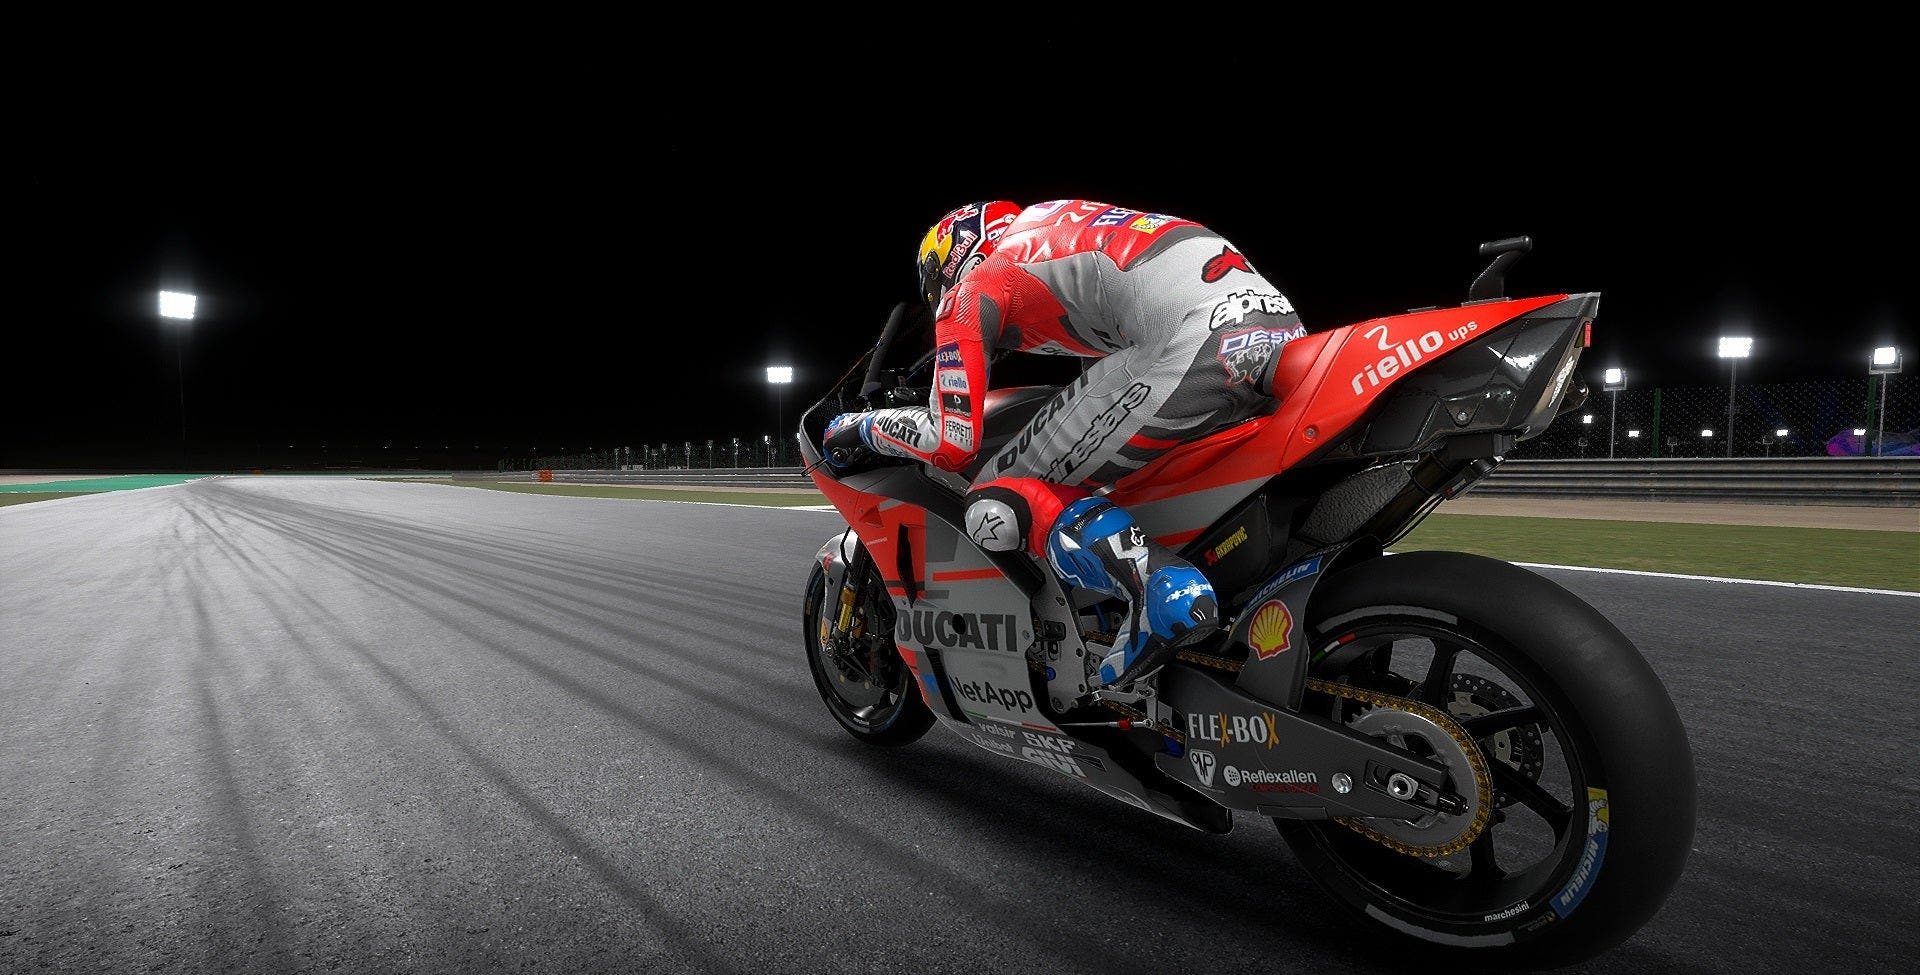 Análisis de MotoGP 19 - Xbox One 1